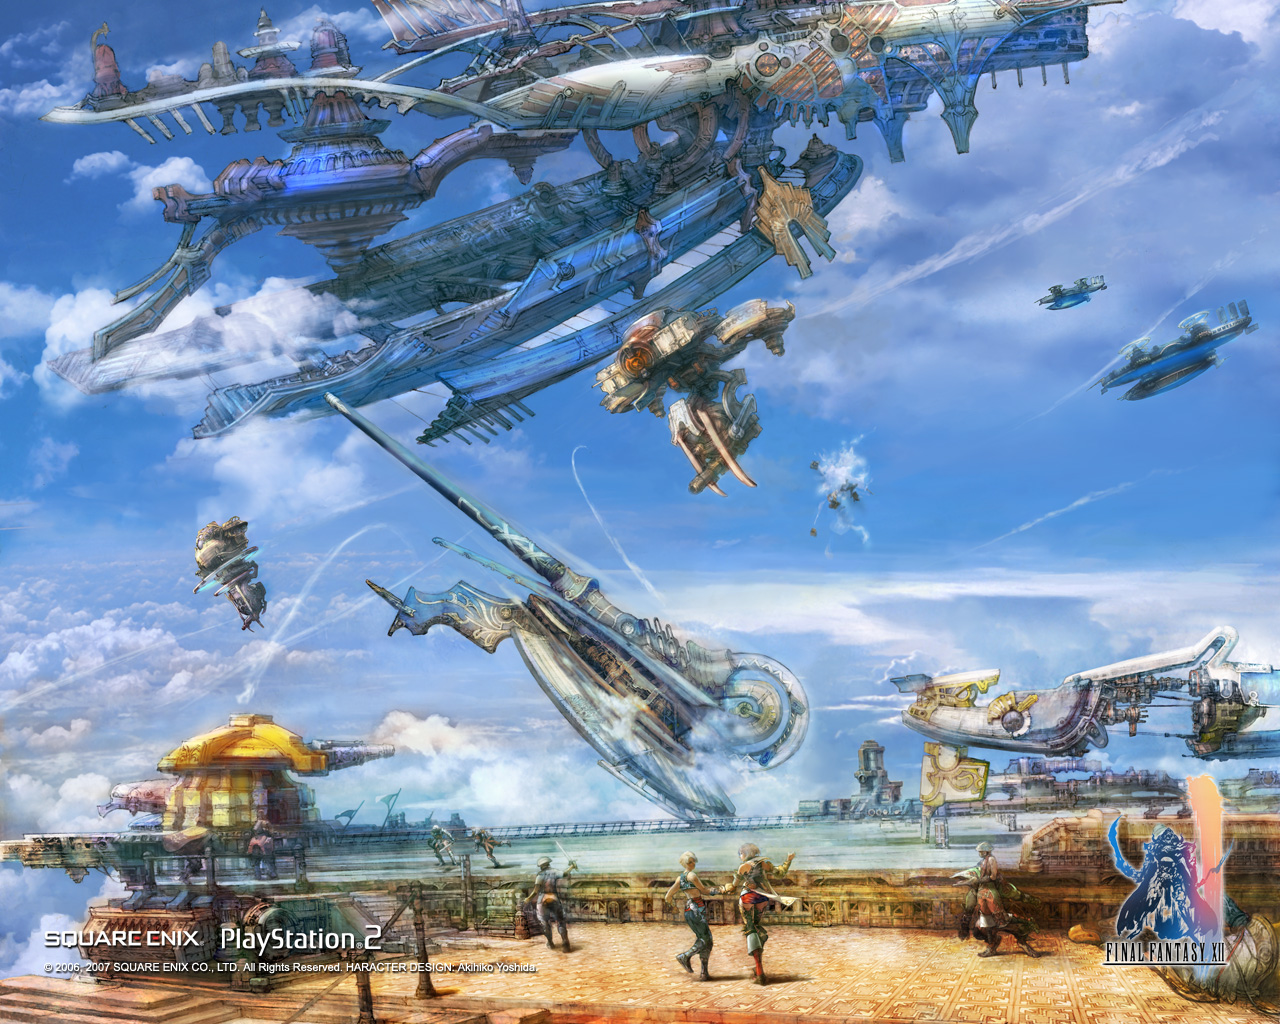 ffxii-airship-wallpaper2-1280x1024.jpg